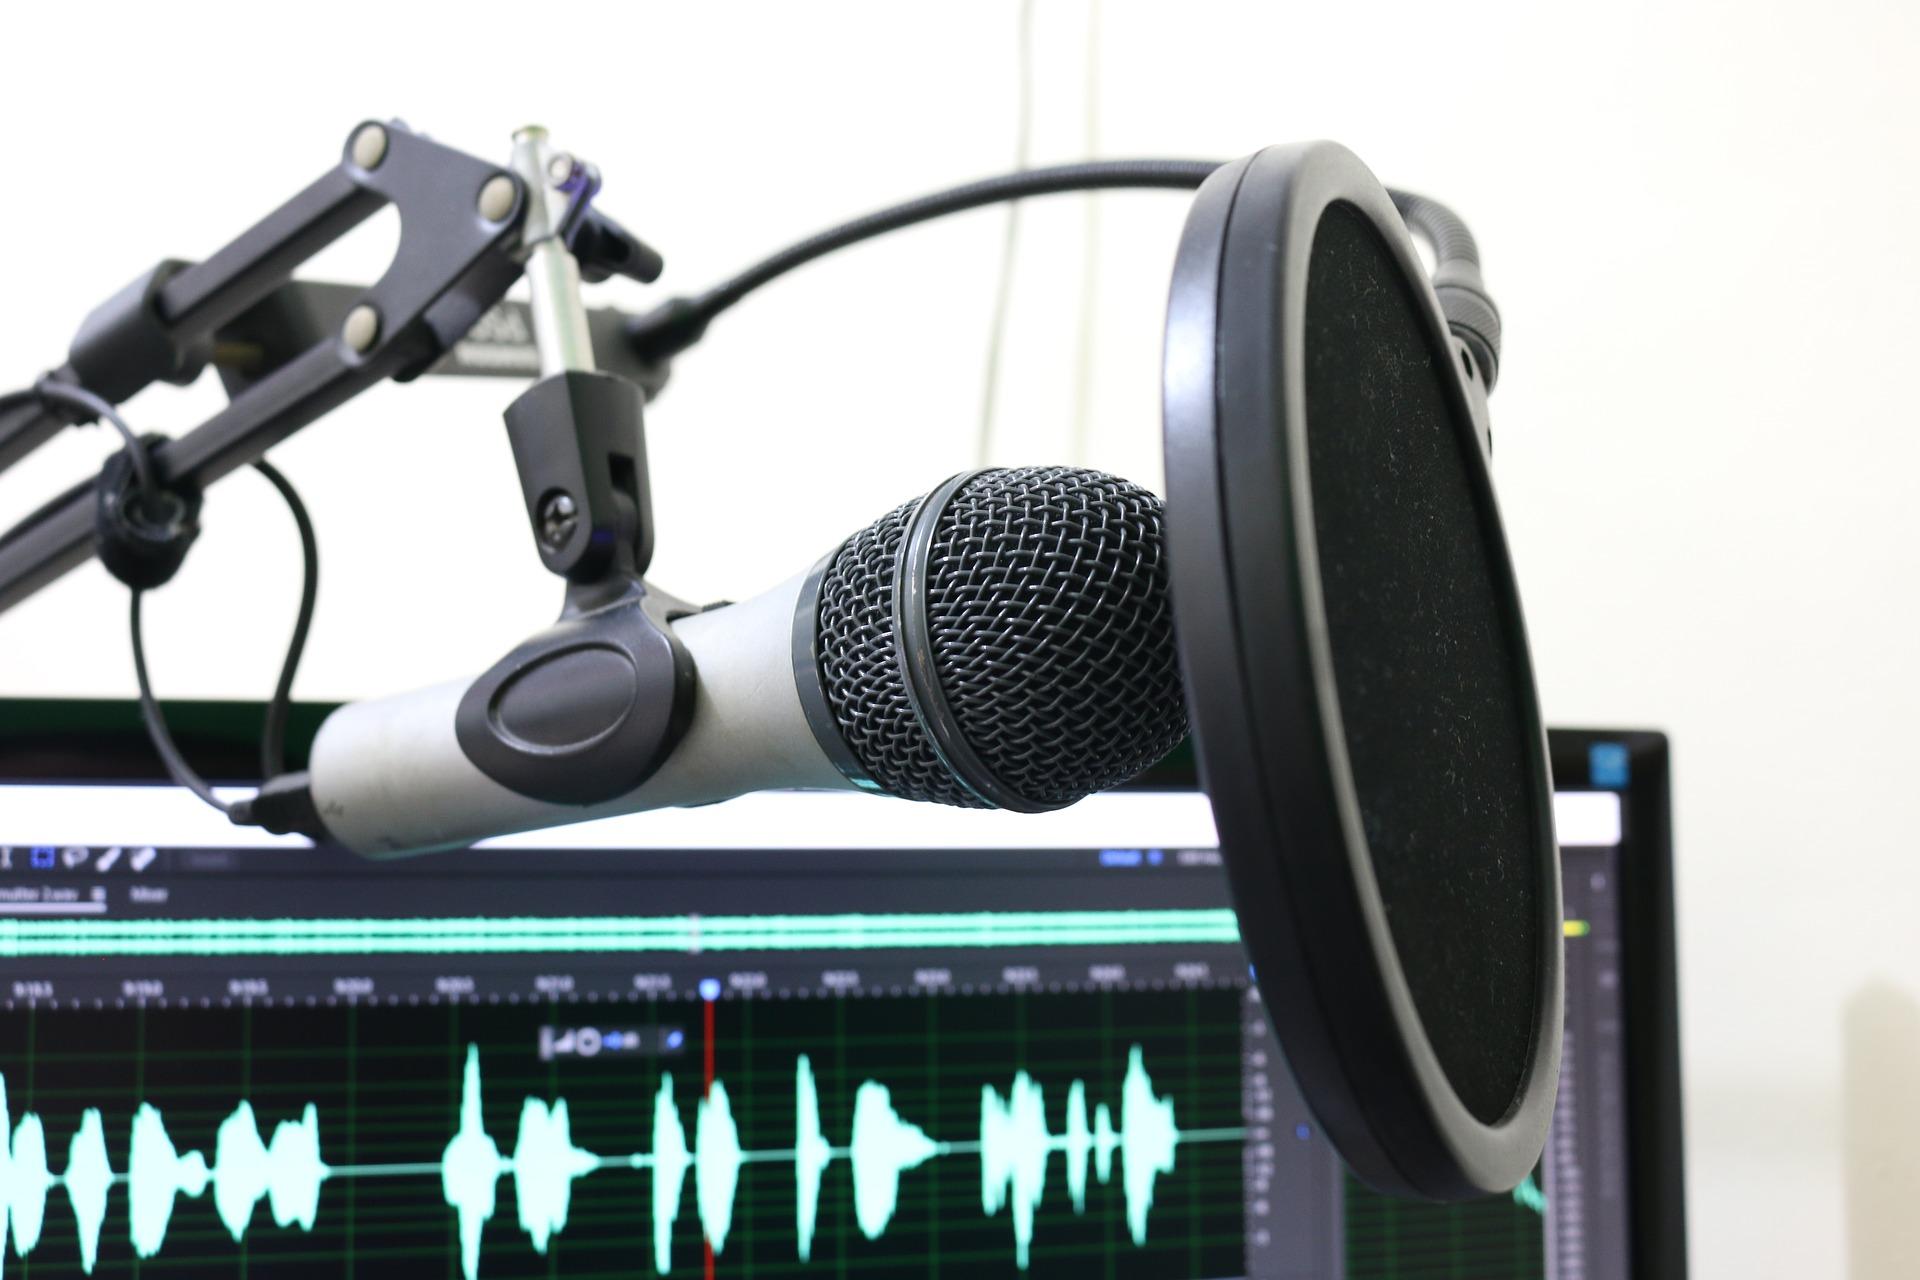 microphone-2170045_1920 (1).jpg